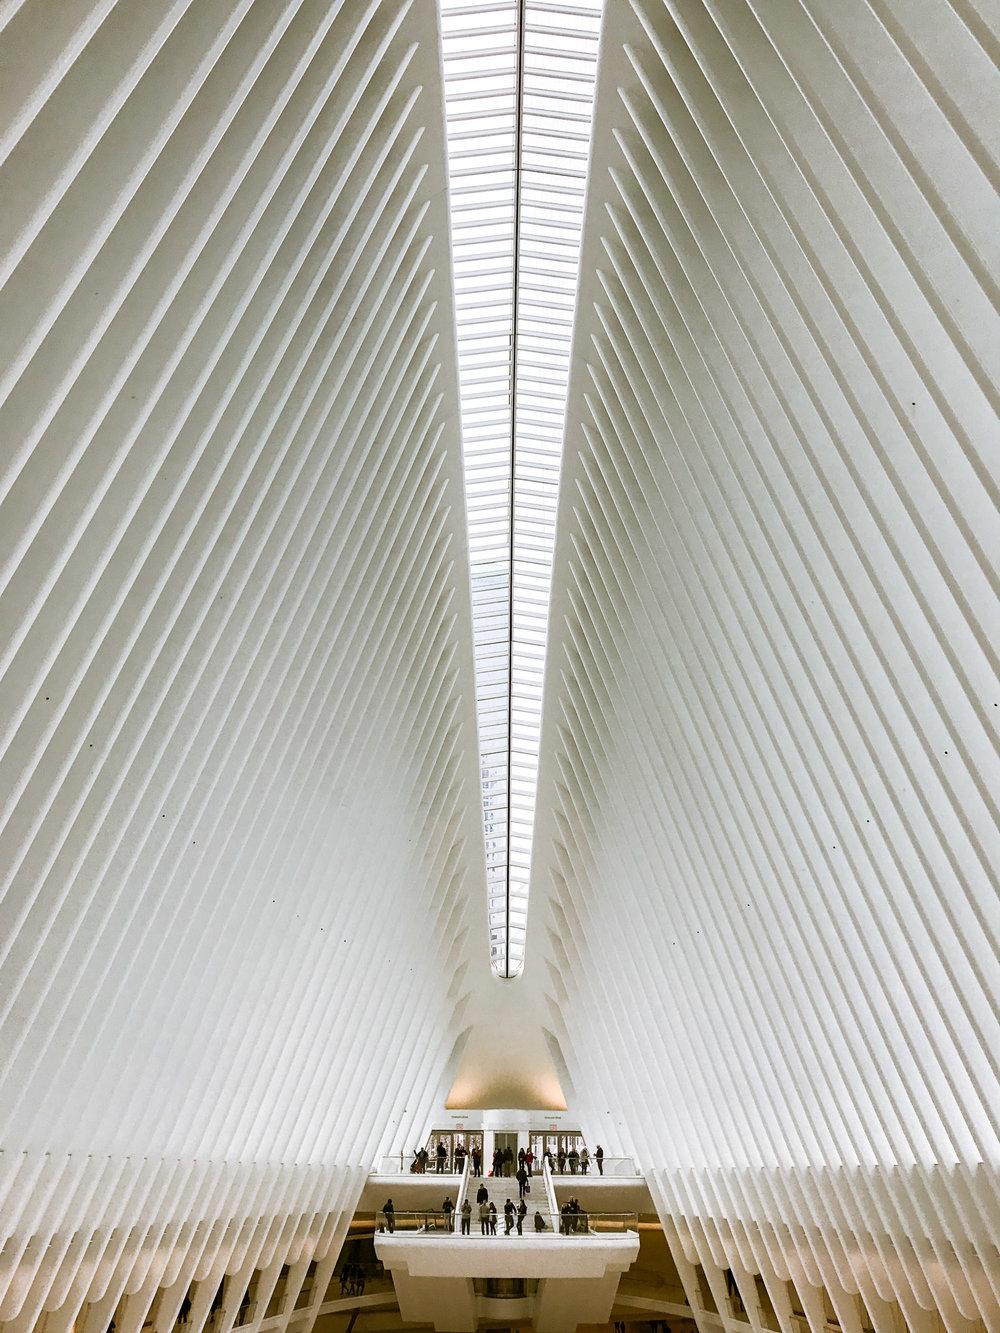 simon-abrams-oculus-1.jpg